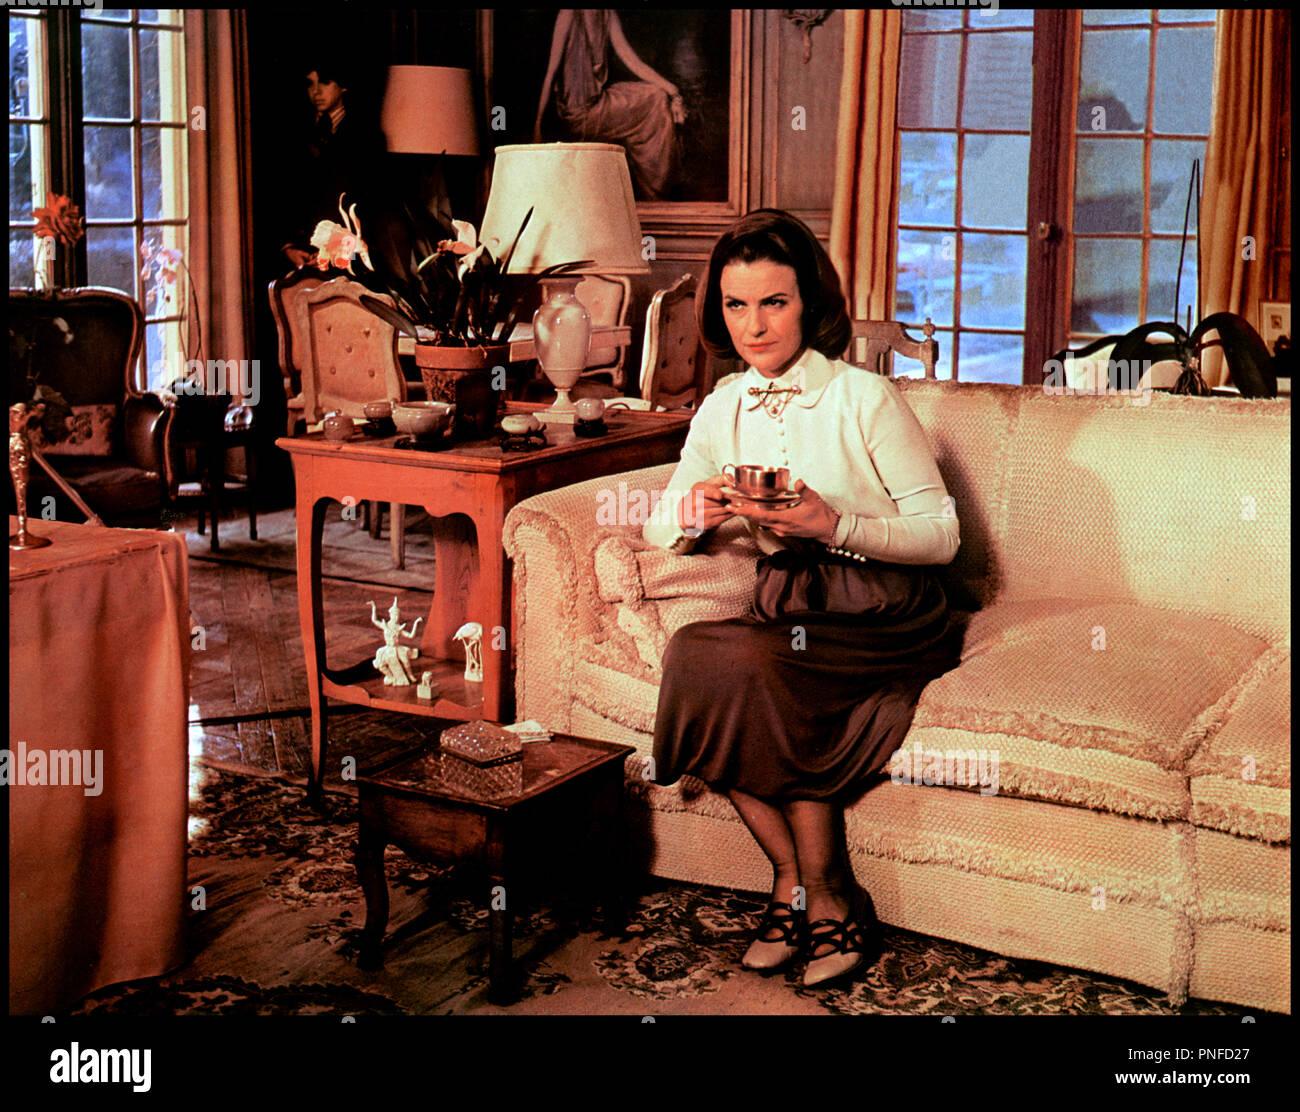 Dawn Lake,Bettina Carlos (B. 1987) Erotic pics & movies Marsha Hunt (actress, born 1946),Vicky Vette